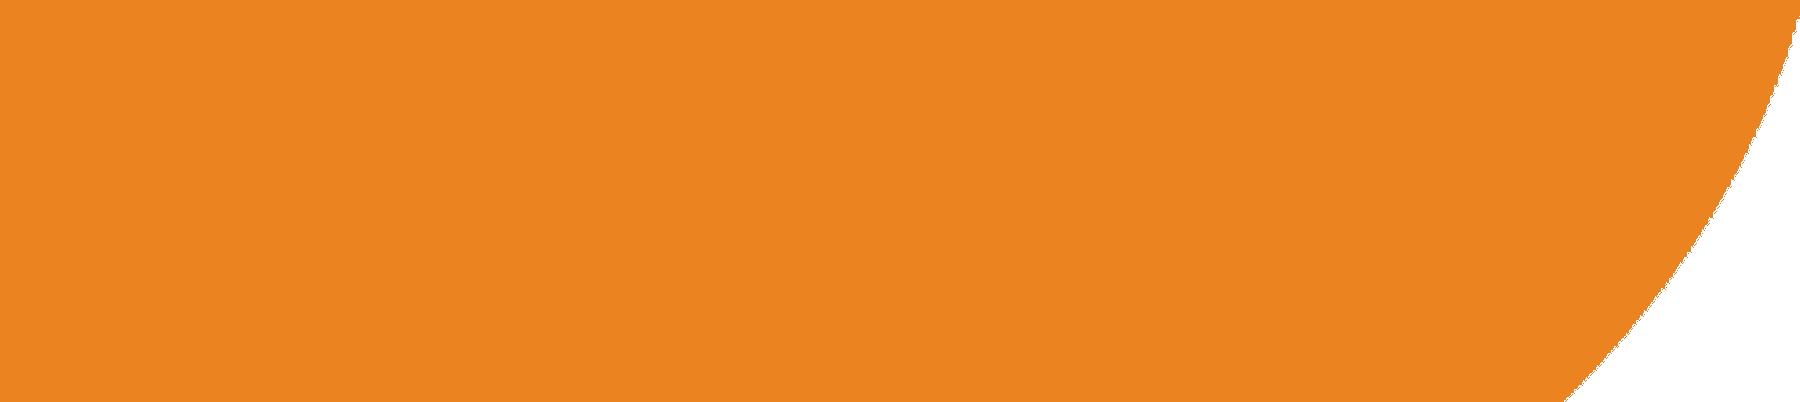 orange-bar-from-left-fw